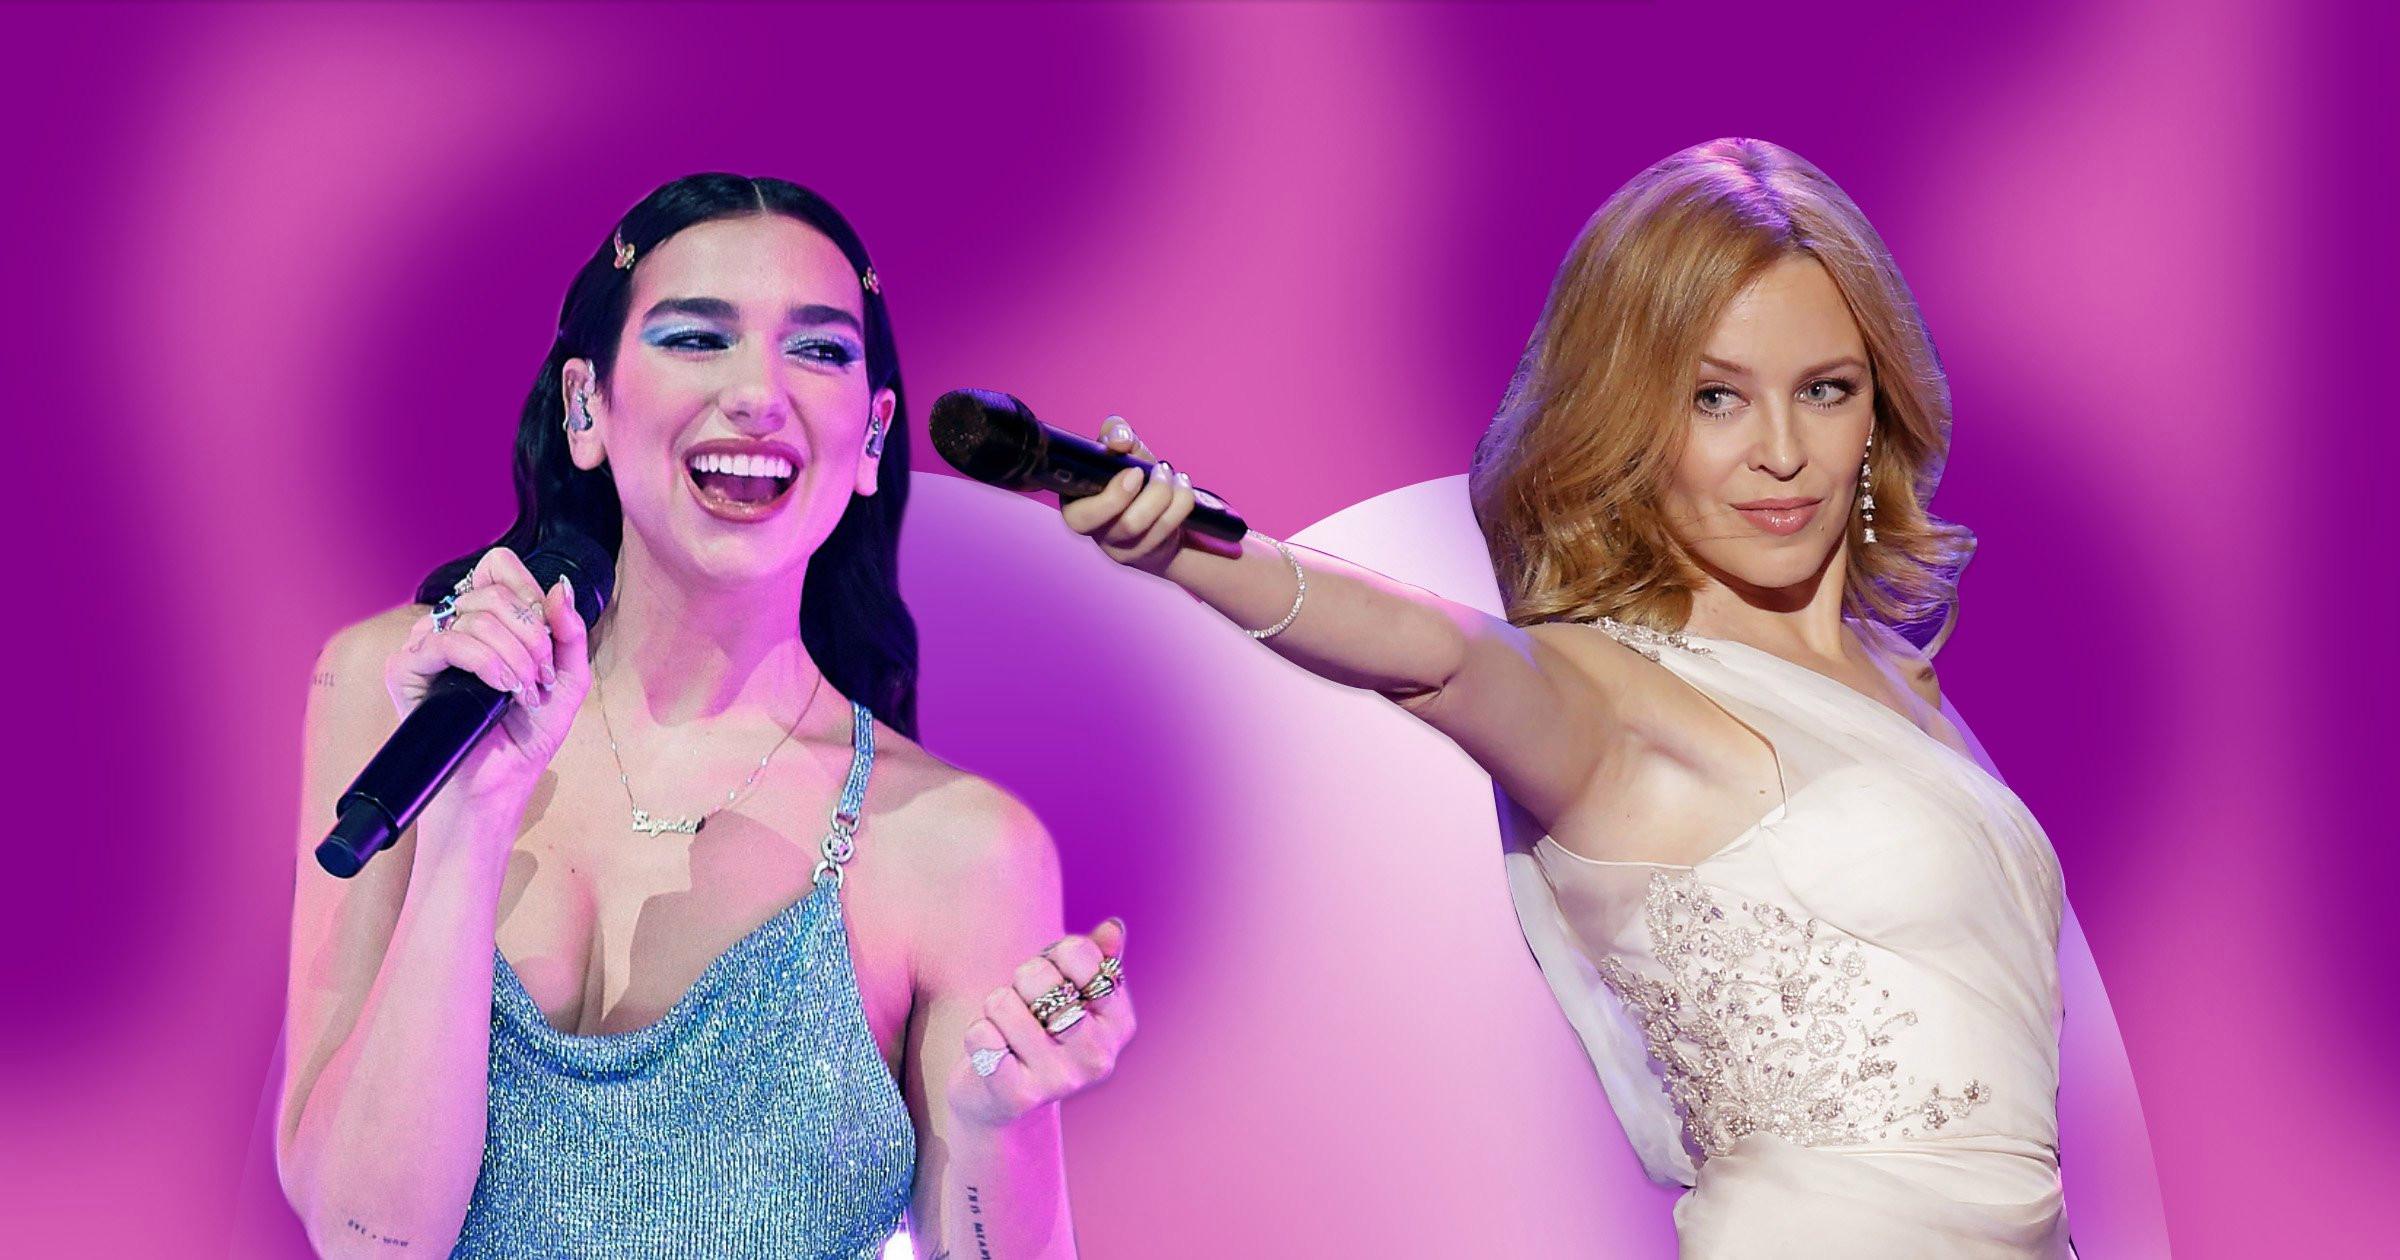 Kylie Minogue y Dua Lipa,se fusionan